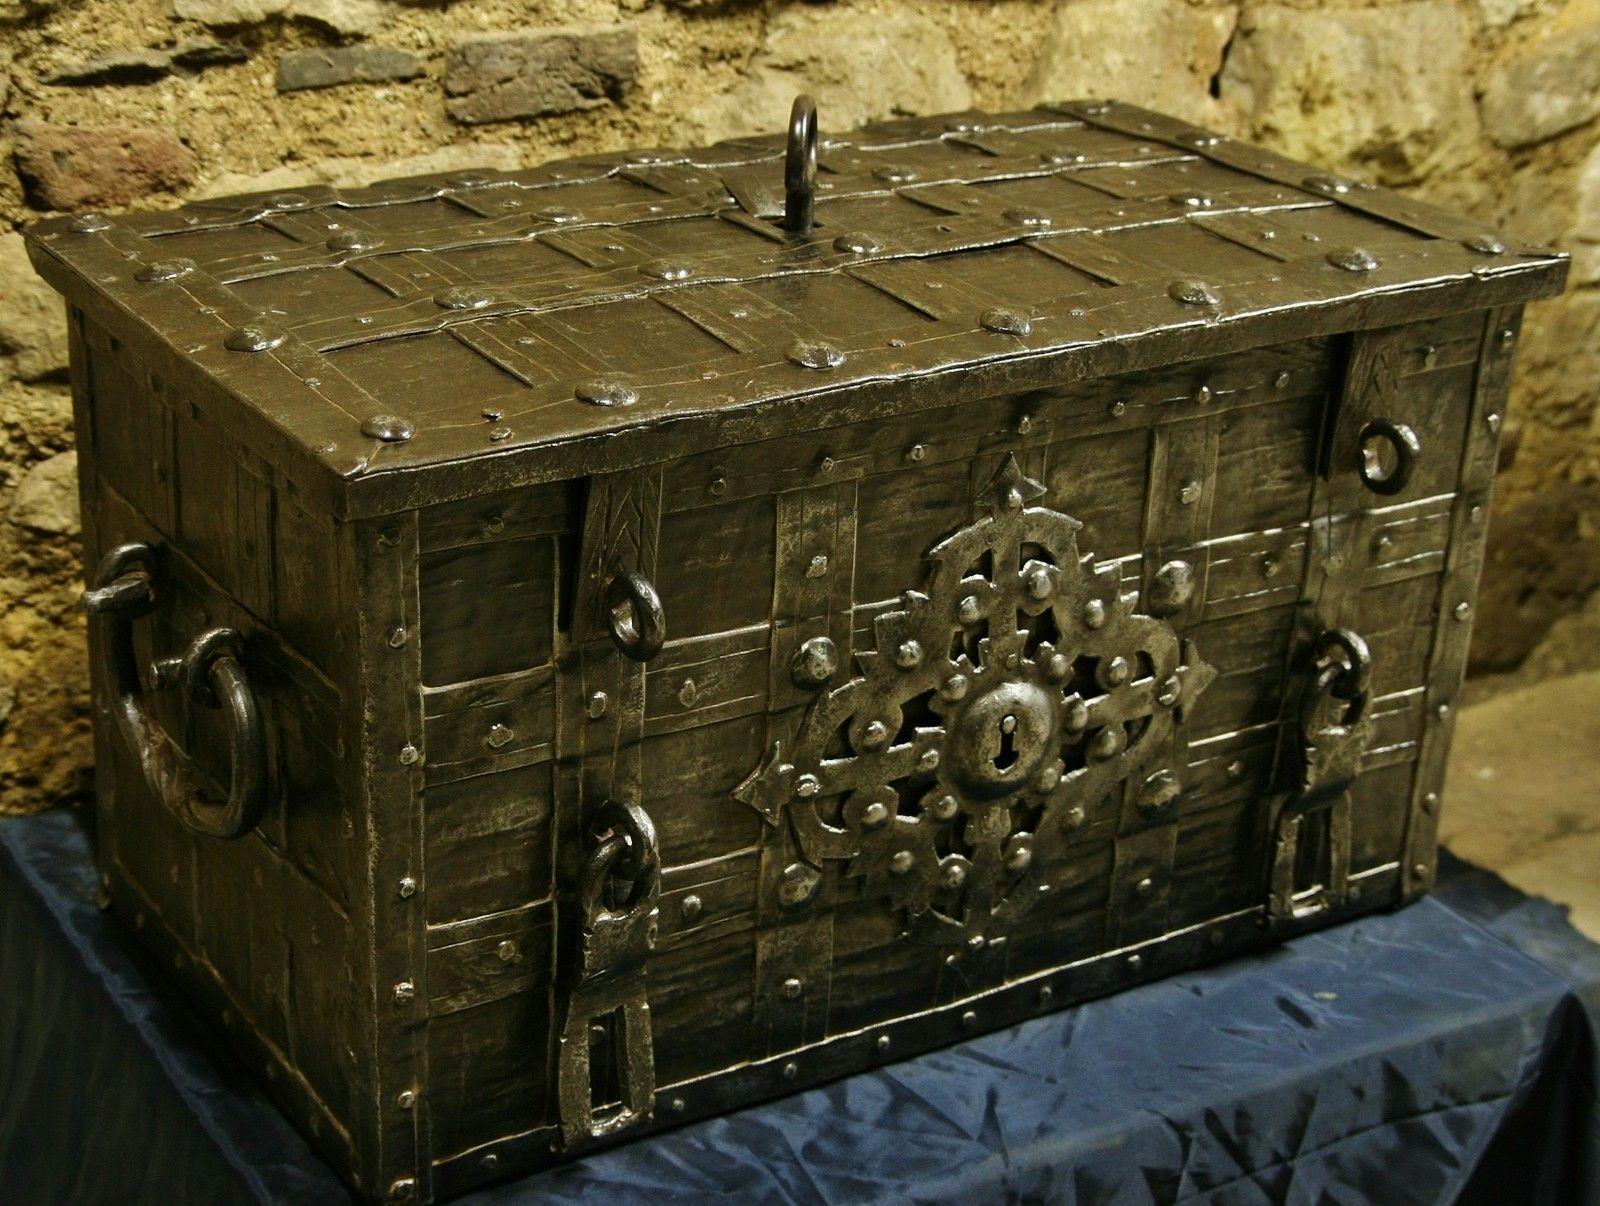 cassaforte soldtruhe geldkasse eisentruhe aus n rnberg um 1600 padlocks cadenas. Black Bedroom Furniture Sets. Home Design Ideas